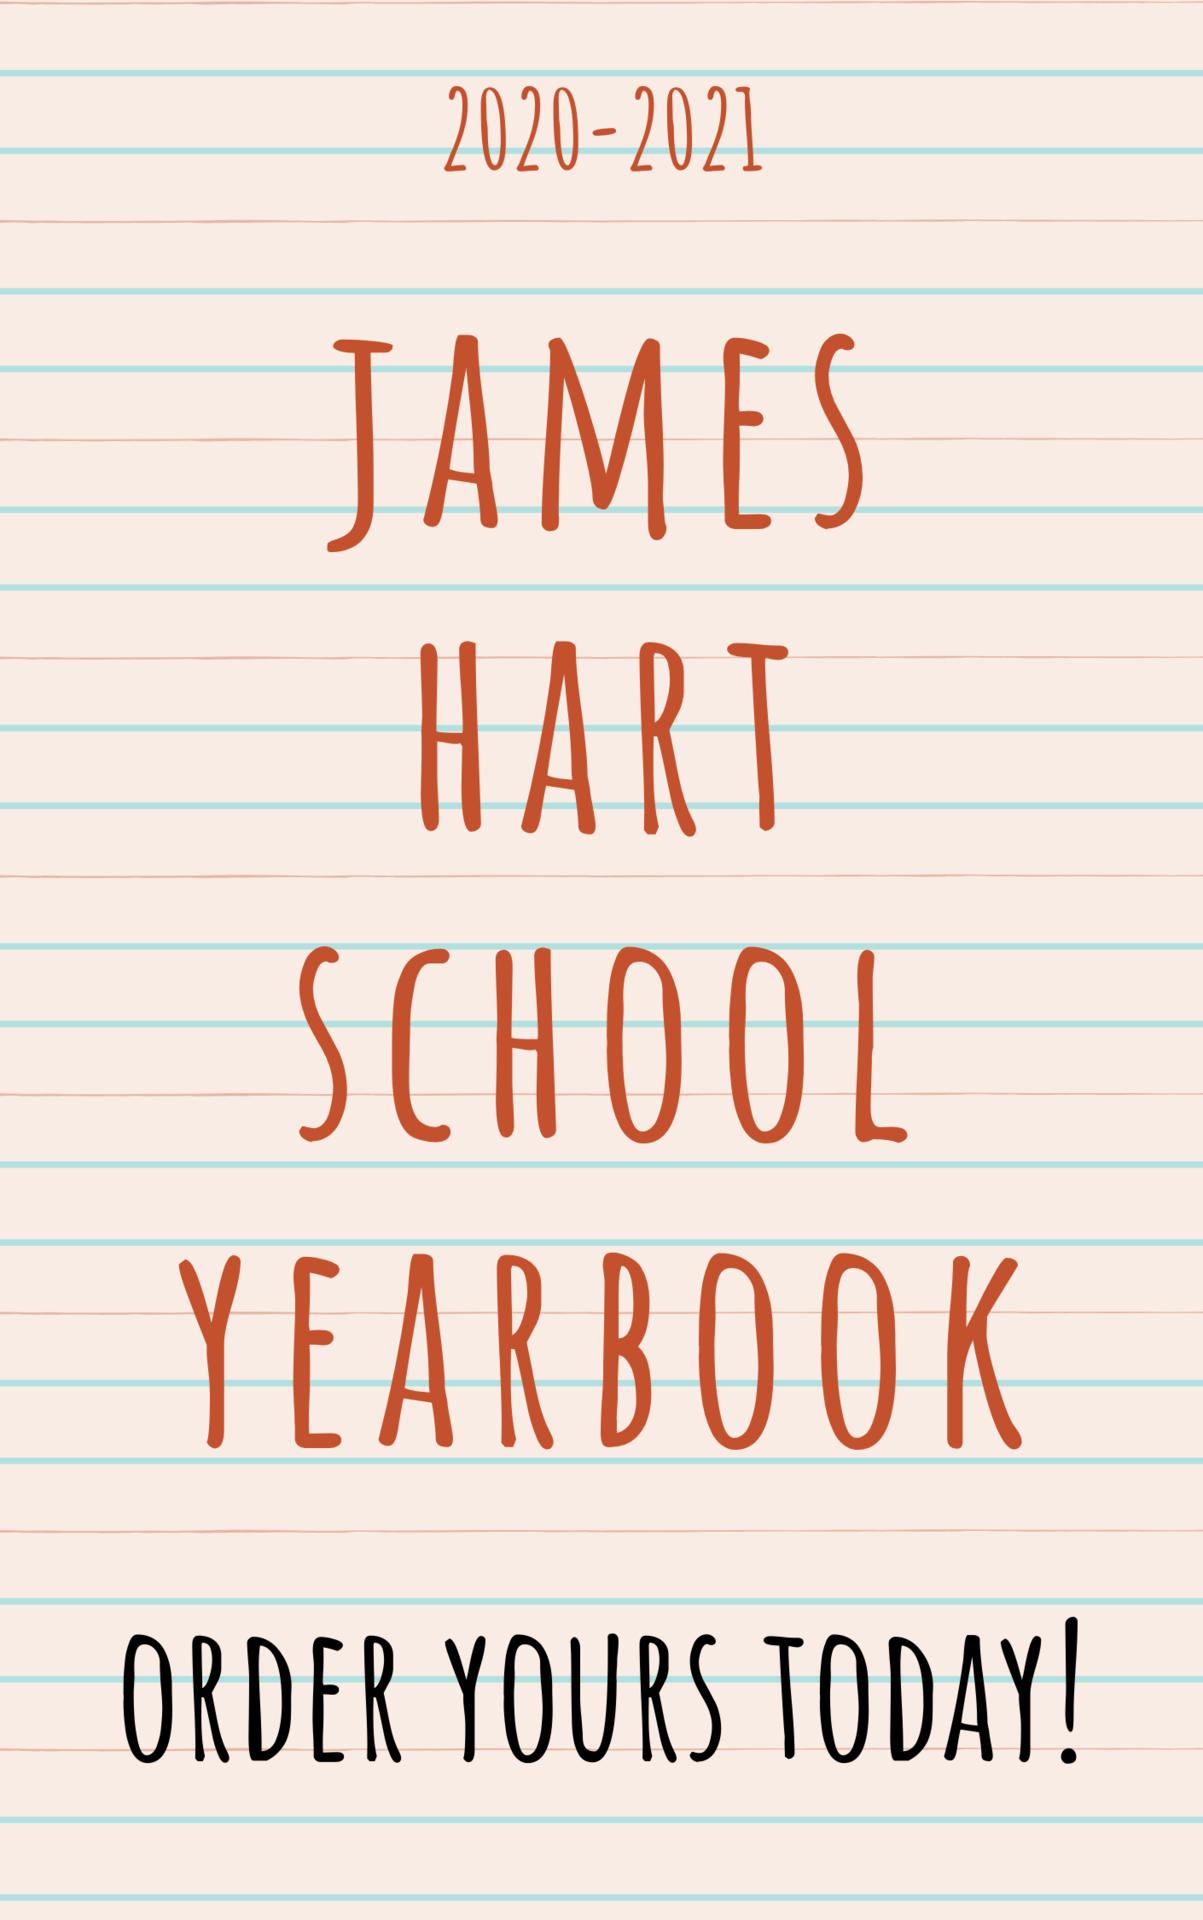 Order Your James Hart Yearbook